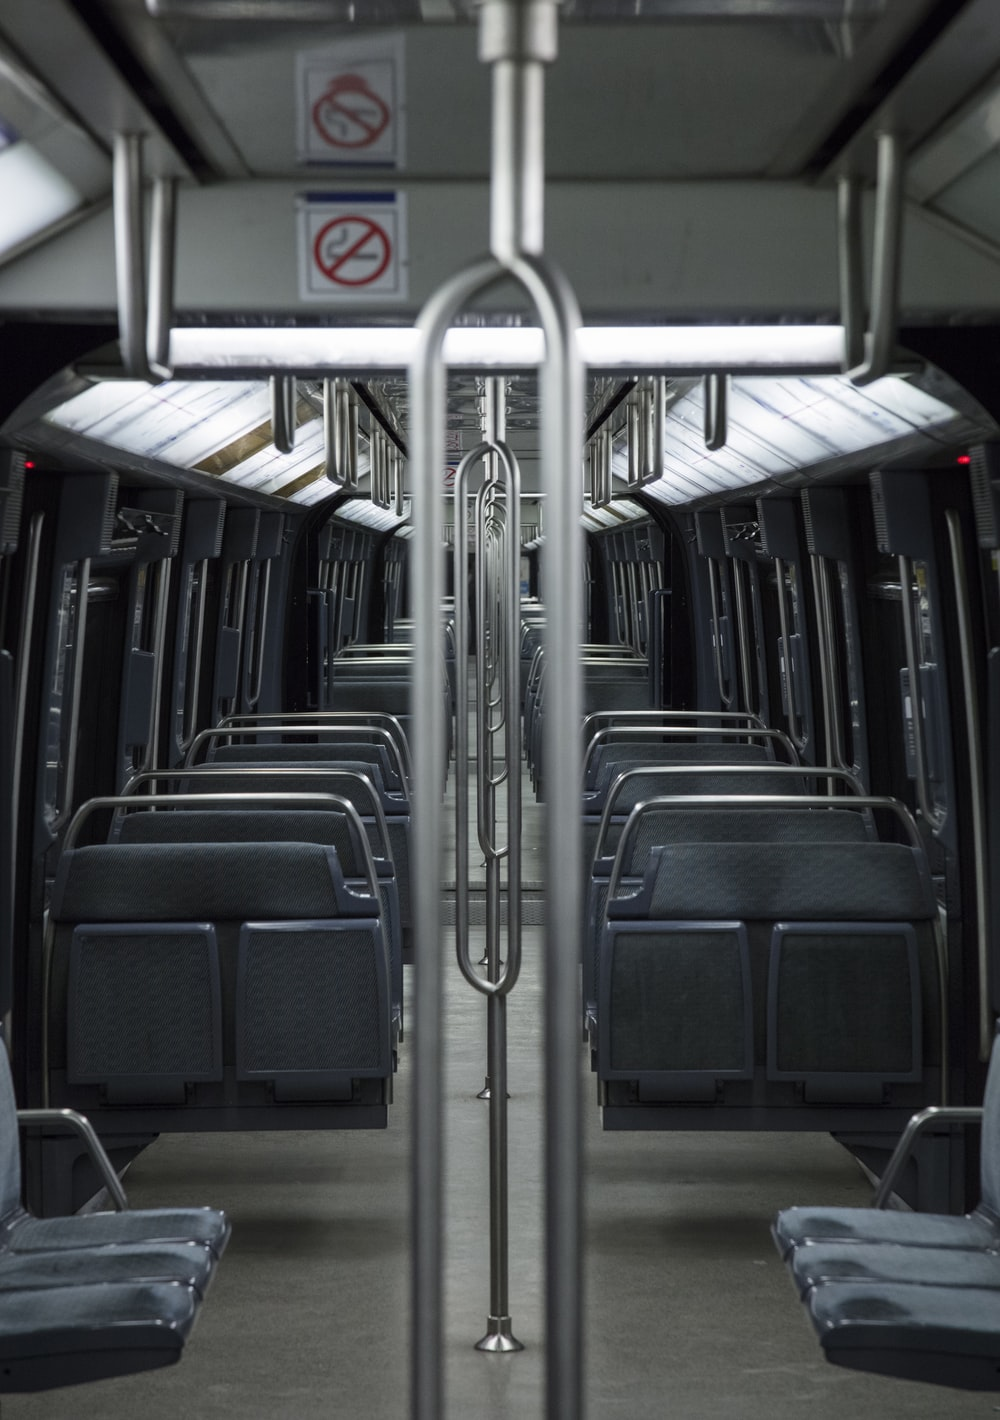 gray and black train interior set